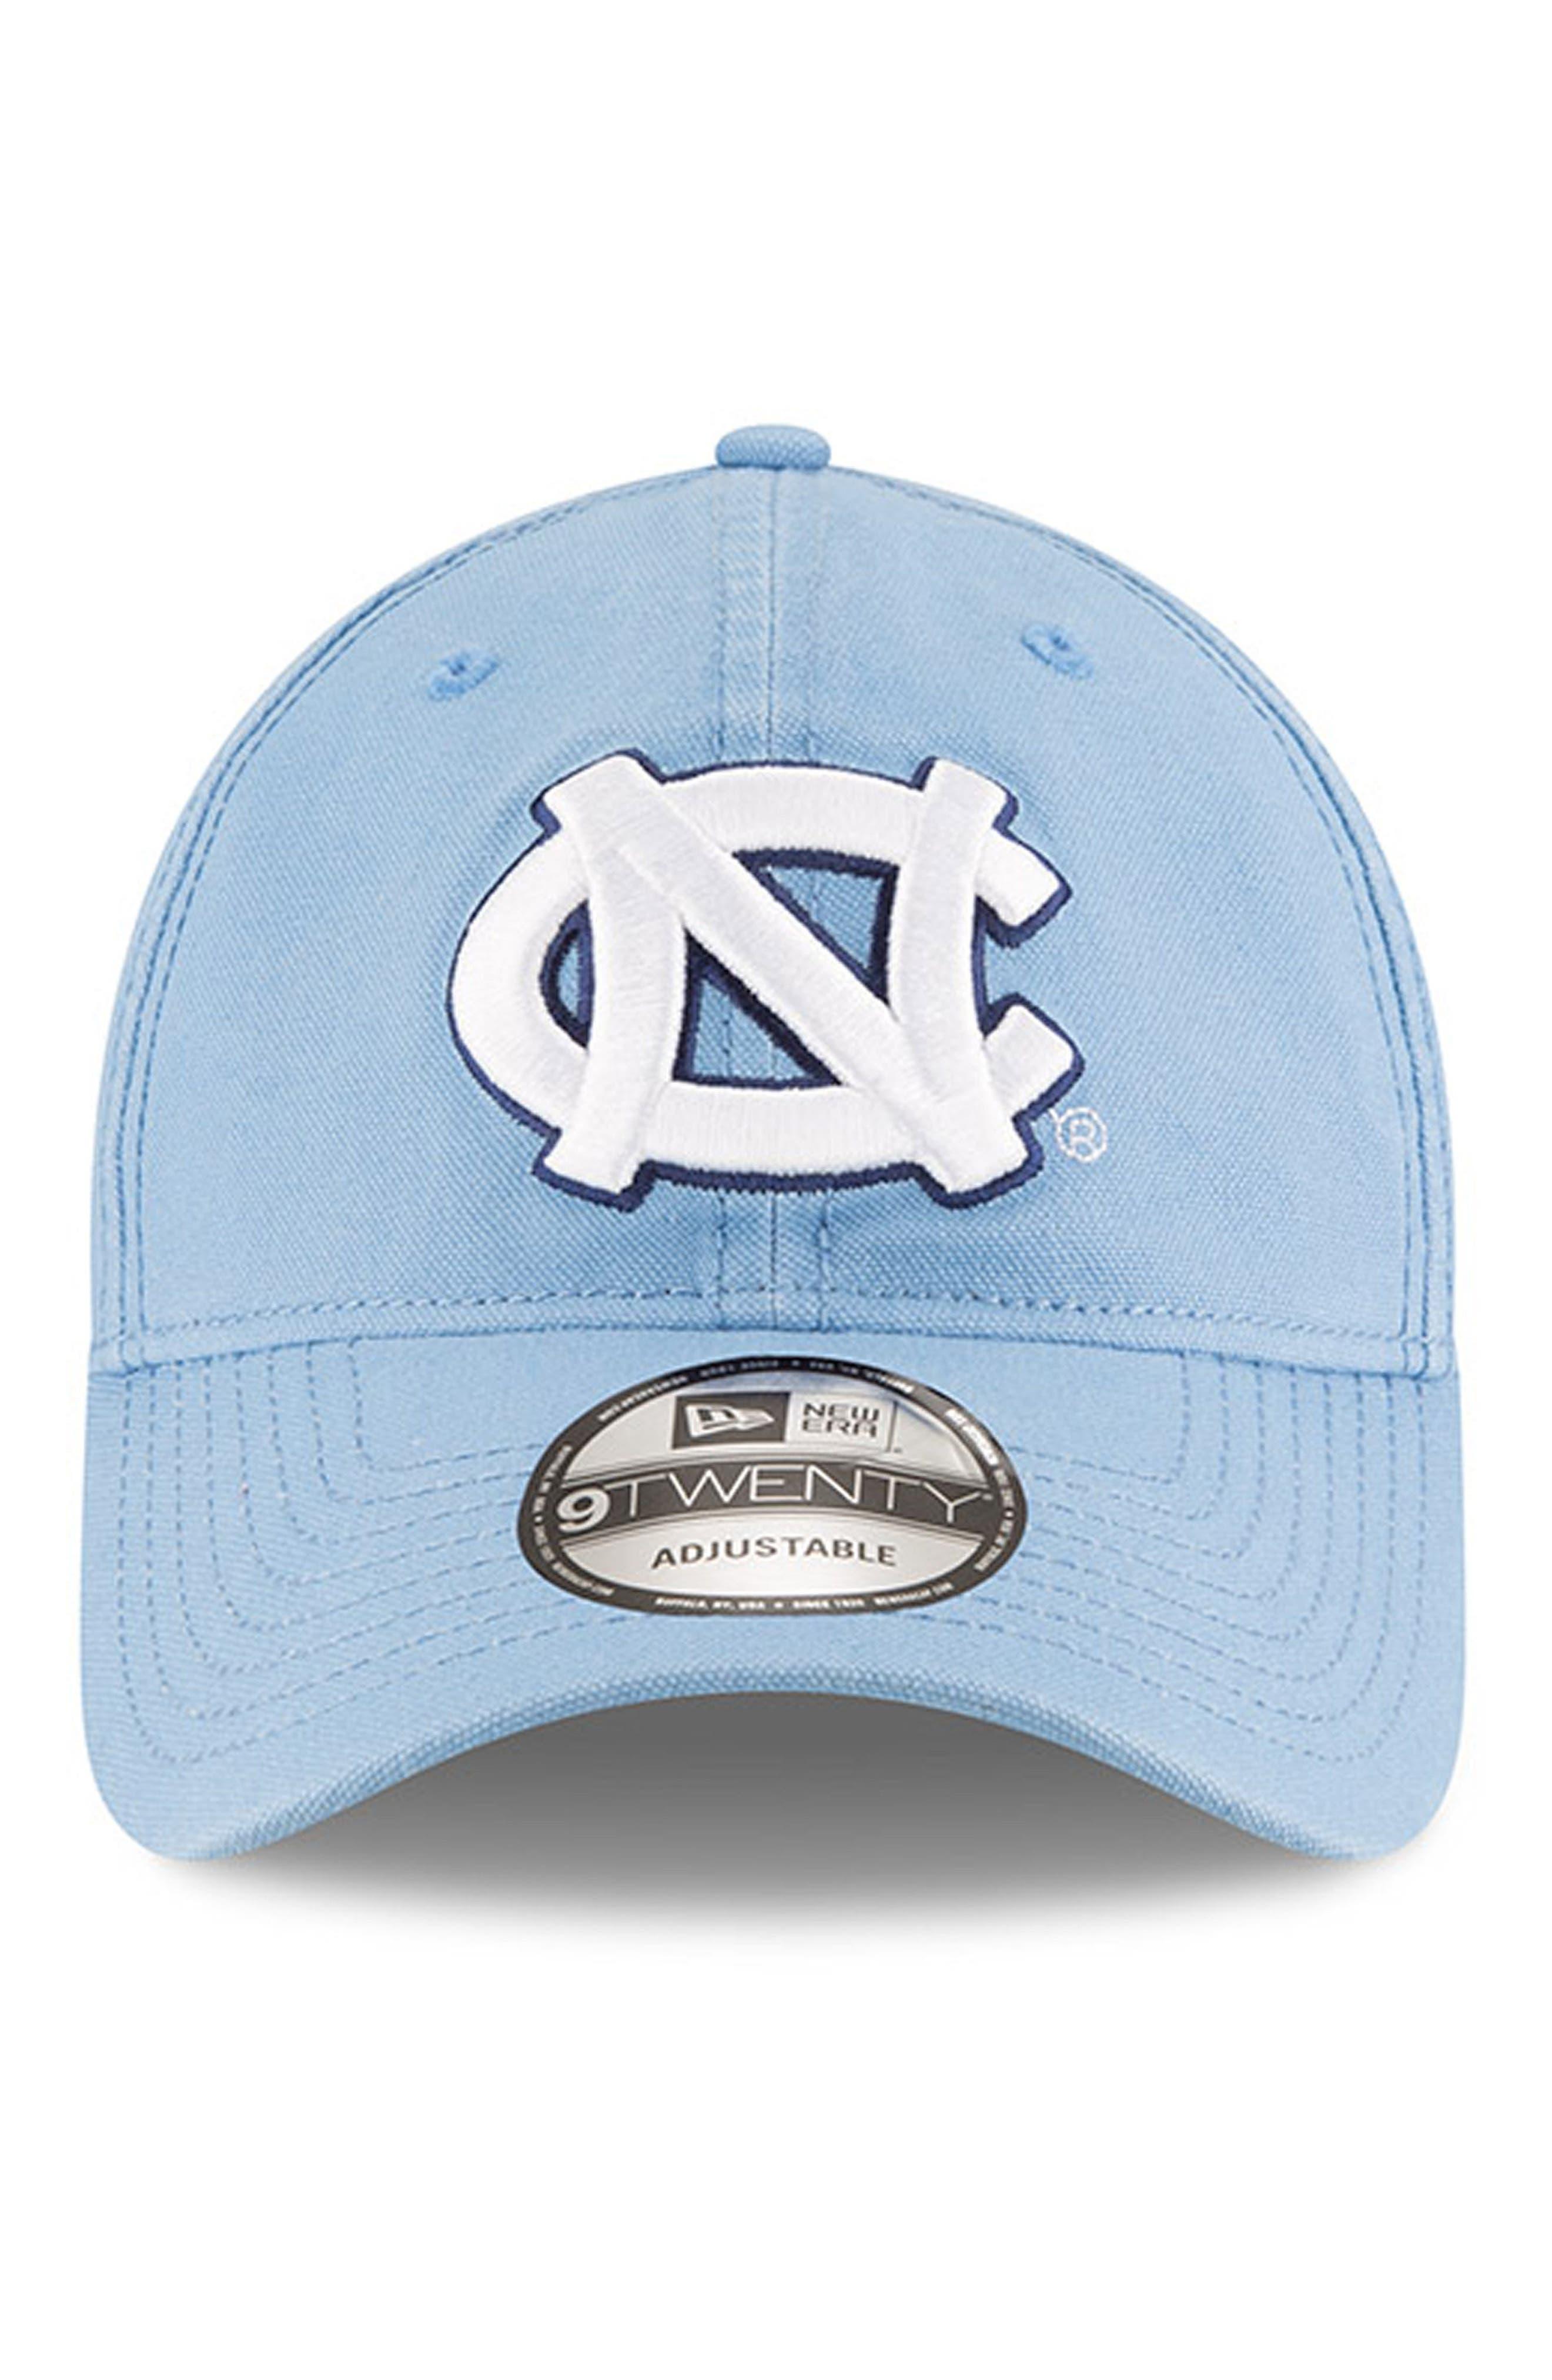 New Era Collegiate Core Classic - North Carolina Tar Heels Baseball Cap,                             Alternate thumbnail 2, color,                             450